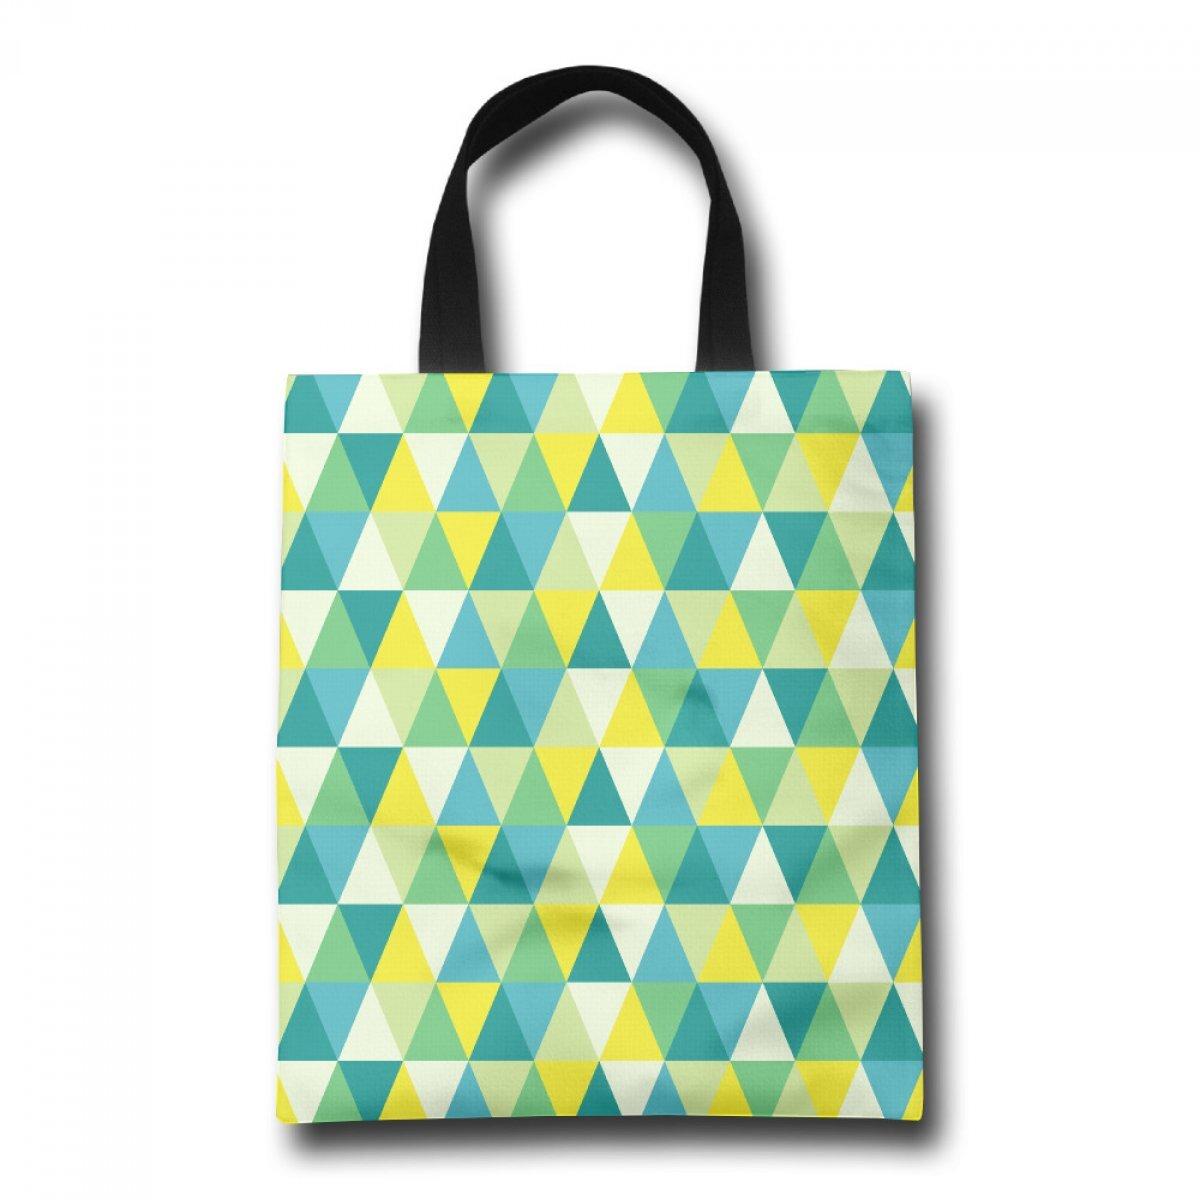 PhoRock Ladies Tote Bag Triangular Geometry Printed Canvas Beach Tote GWJH016 0